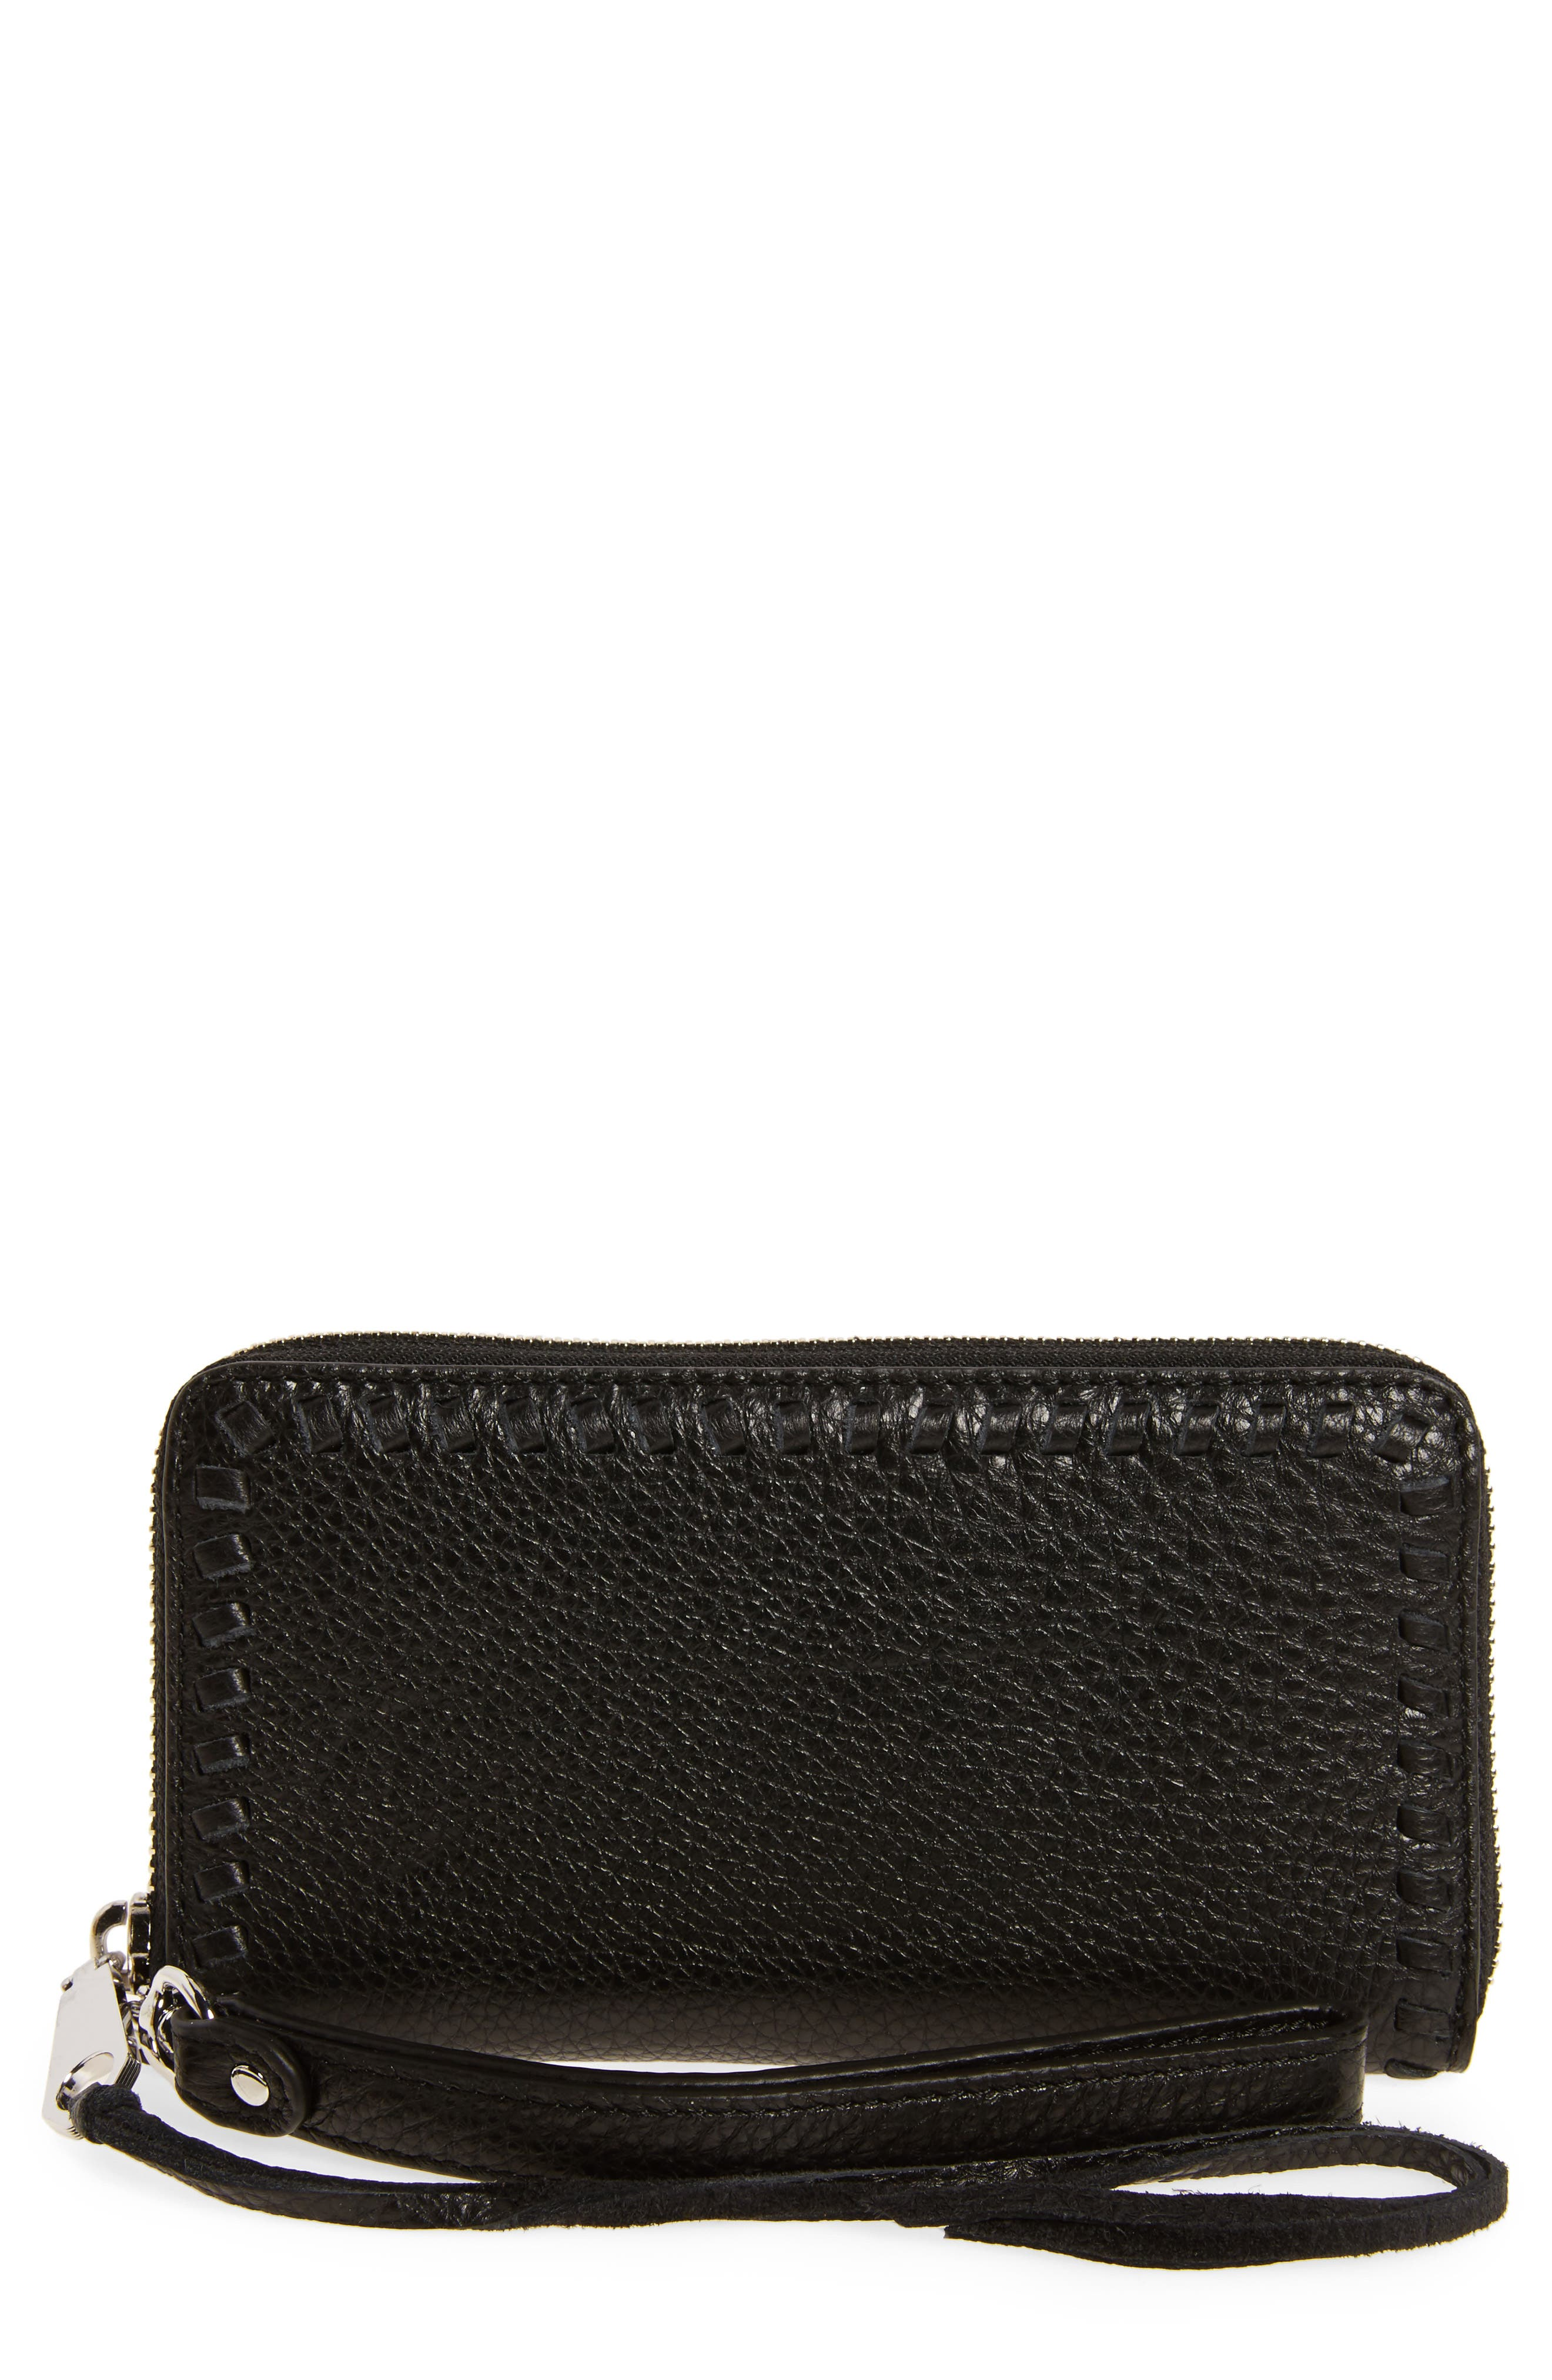 Vanity Leather Phone Wallet,                             Main thumbnail 1, color,                             Black